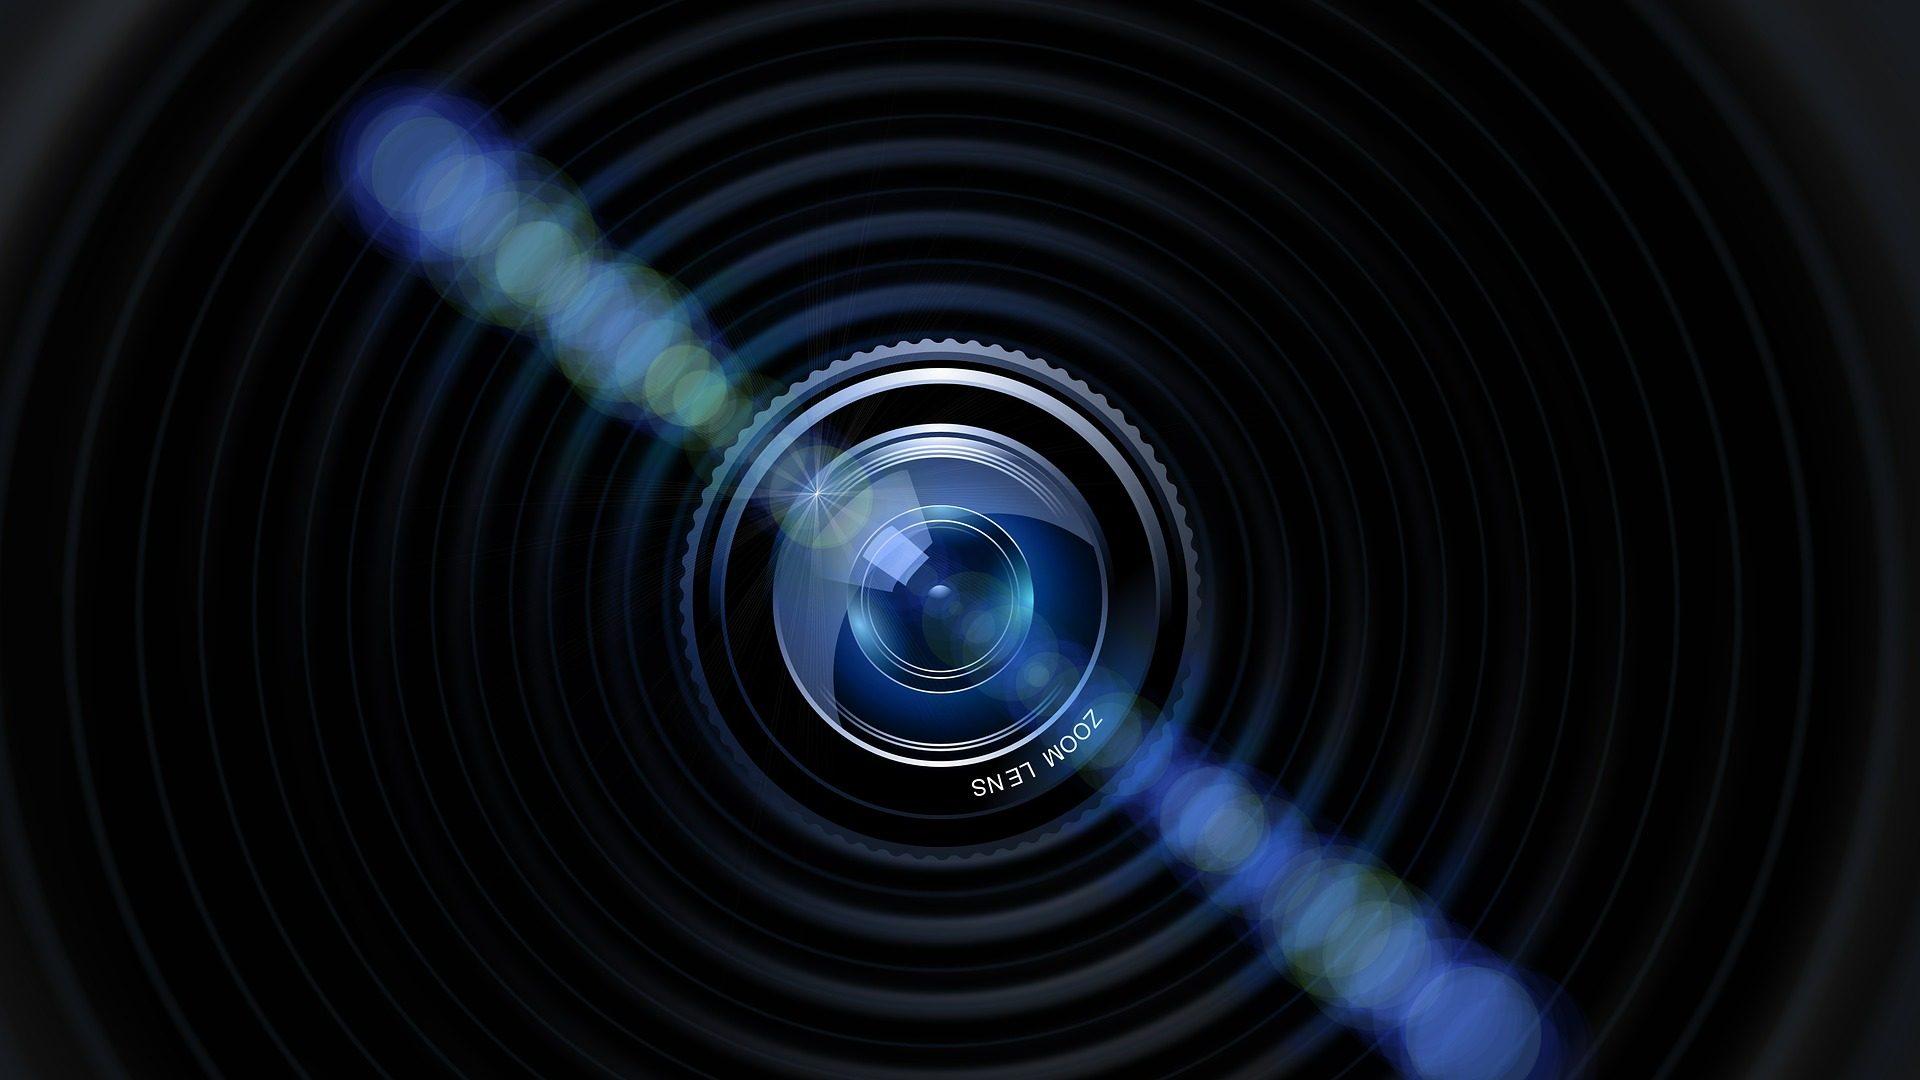 PHOTOADDICT.NET